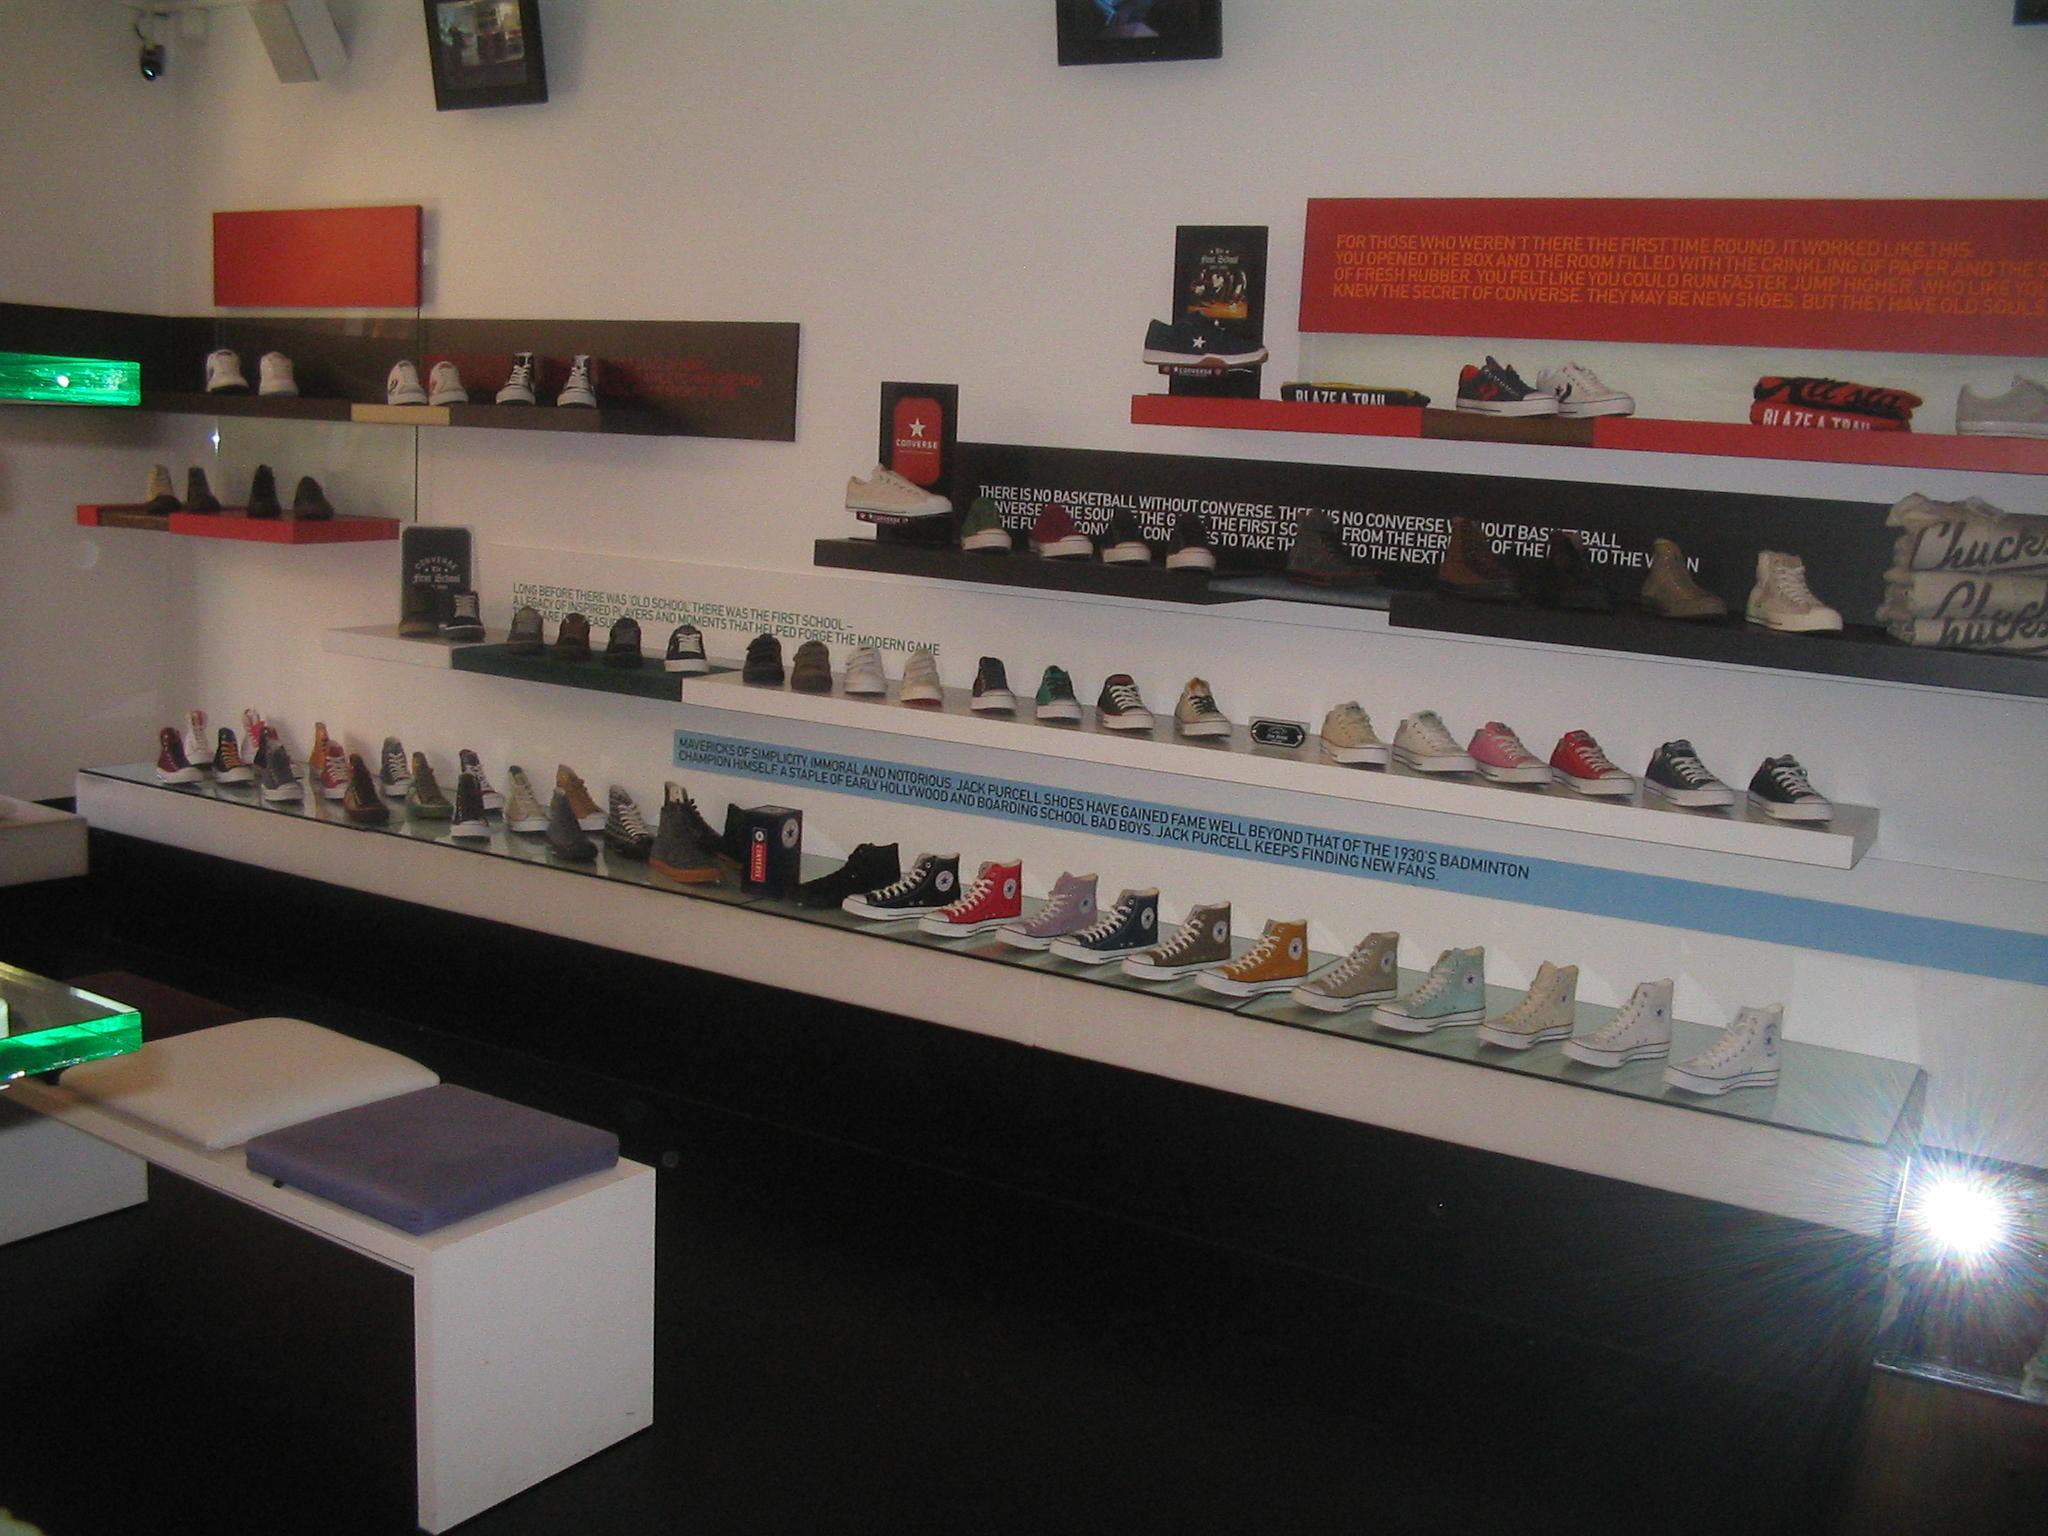 displaymemospics 018